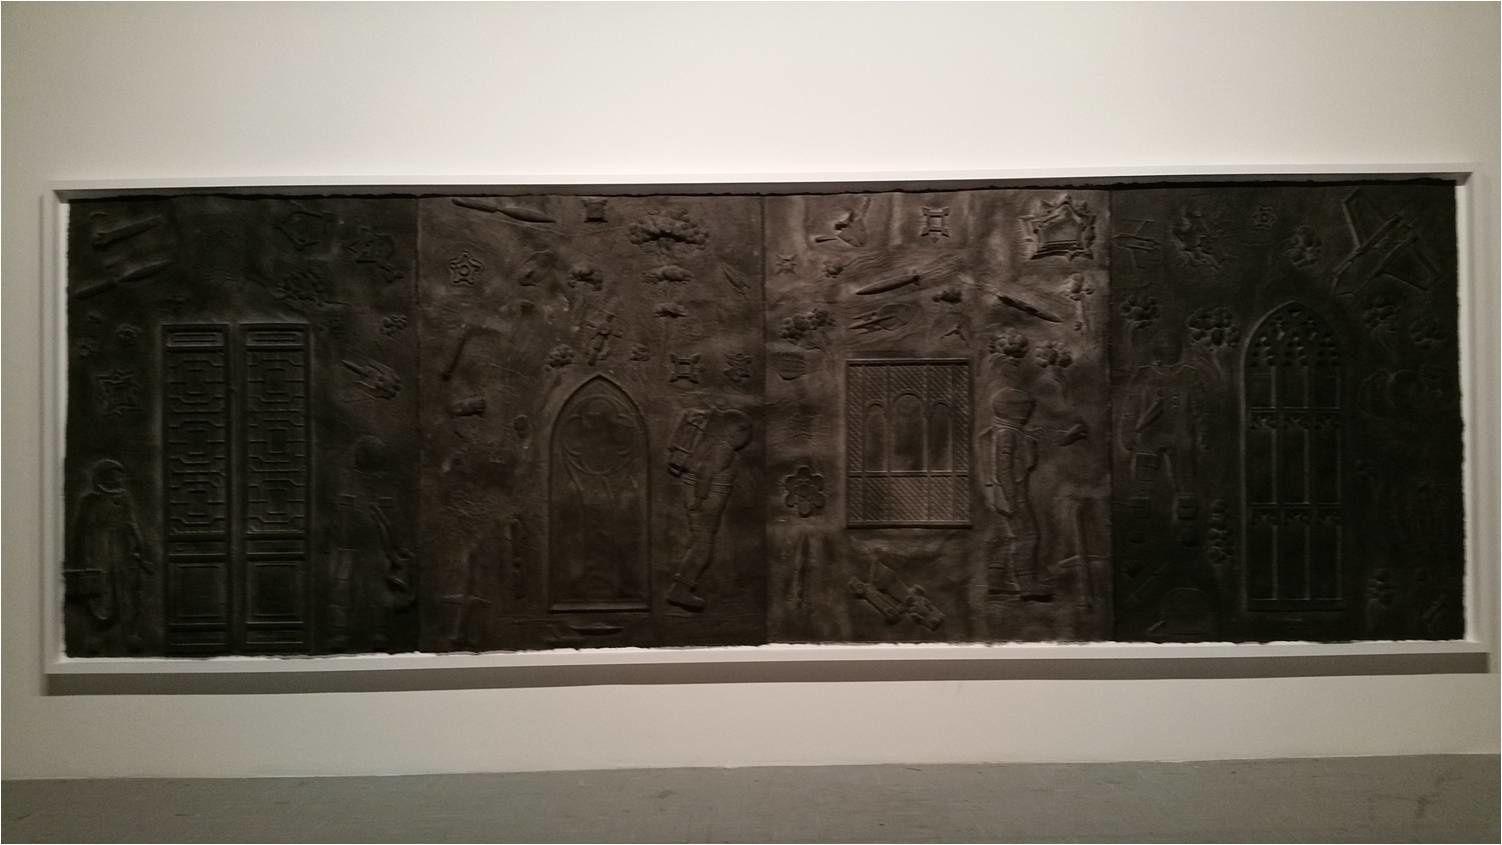 San Gimignano, Galerie Continua, 16-03-16, Exposition Qiu Zhijie